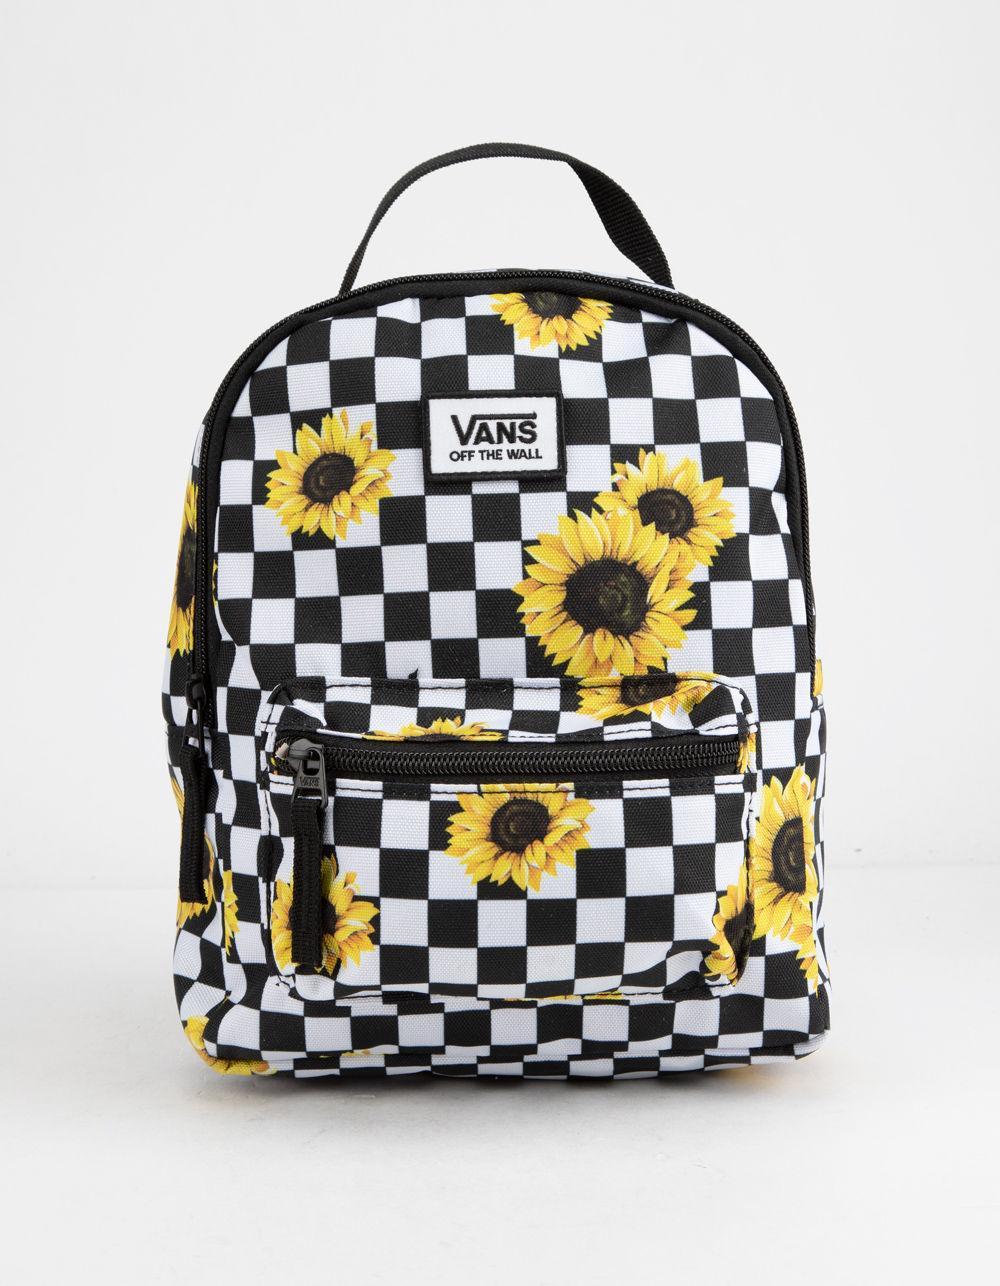 338fbf625a11 Vans - Multicolor Sunflower Check Mini Backpack - Lyst. View fullscreen